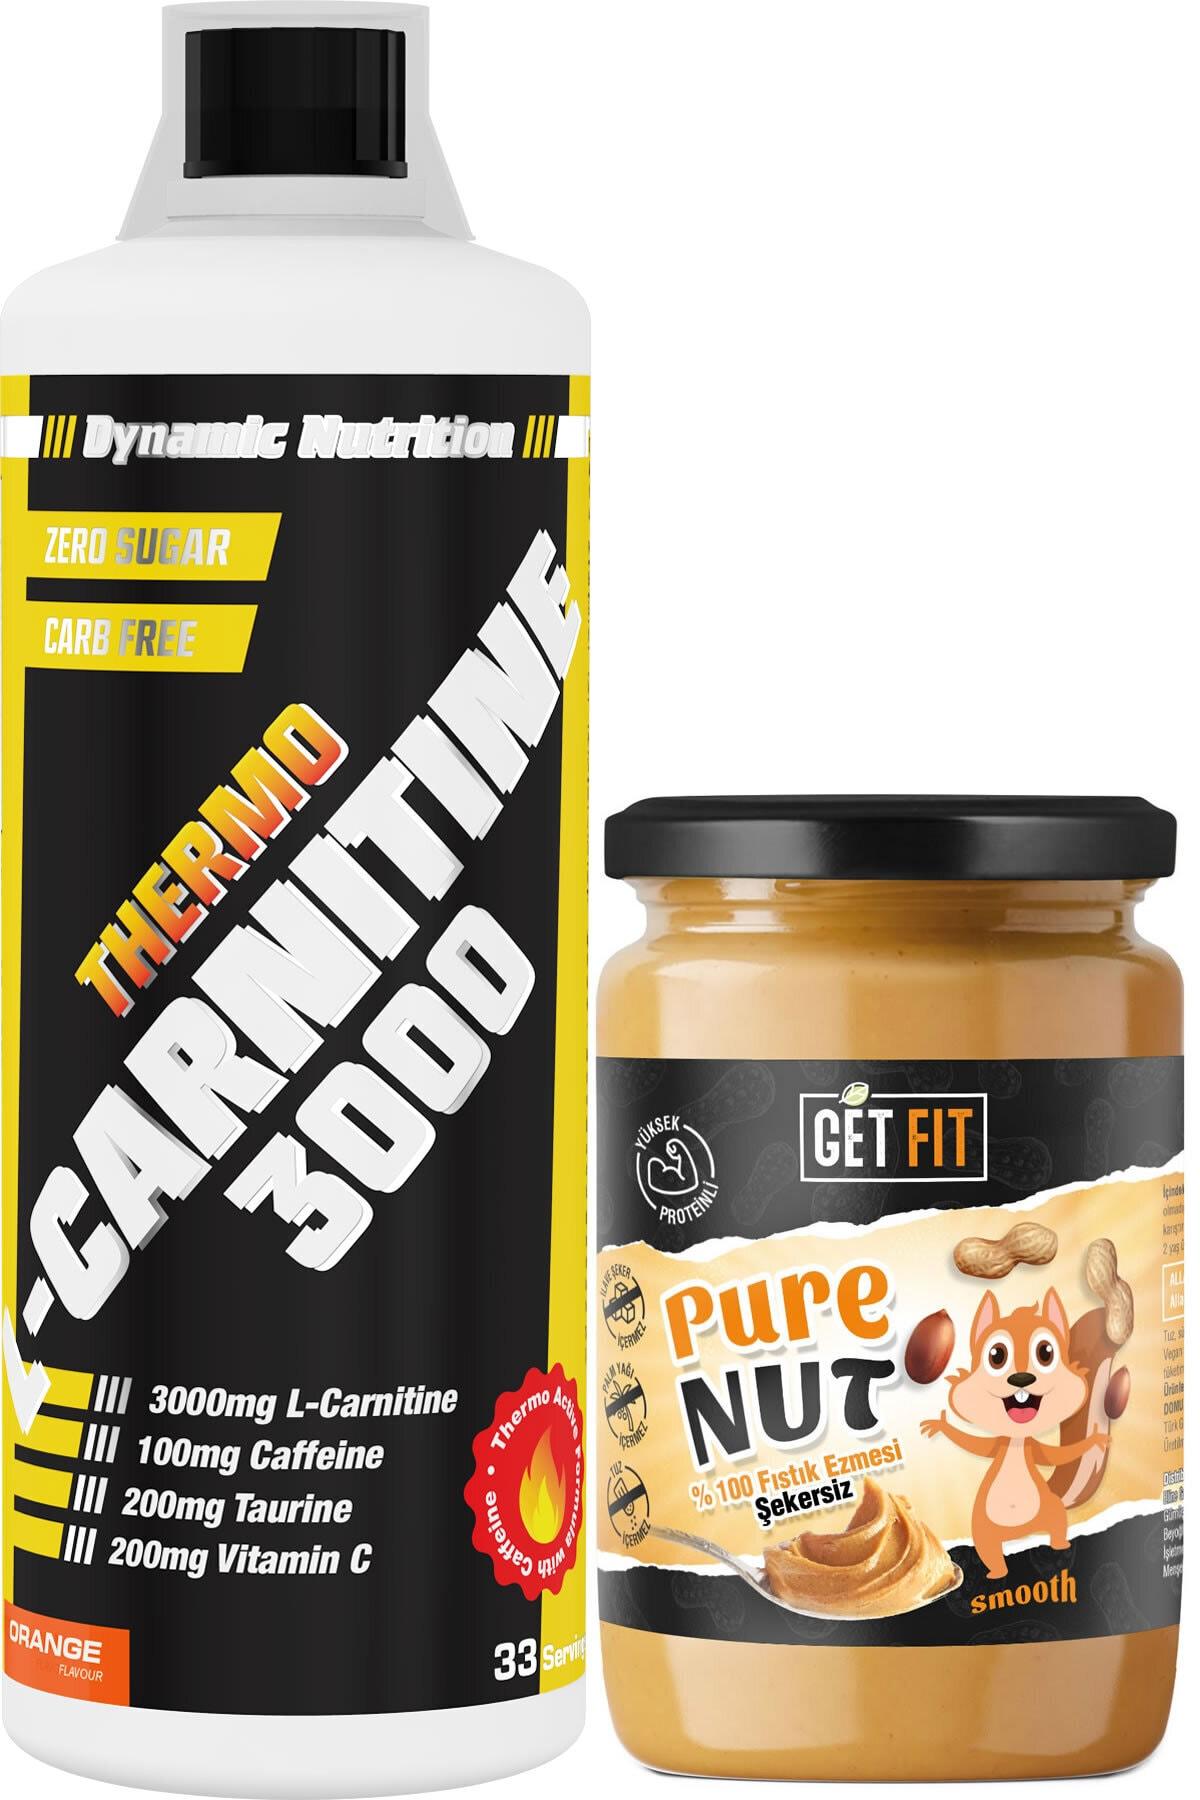 Dynamic Nutrition Dynamic Thermo L-carnitine 3000 Mg 1000 ml + Şekersiz Getfit Purenut Doğal Fıstık Ezmesi 600 gr 1